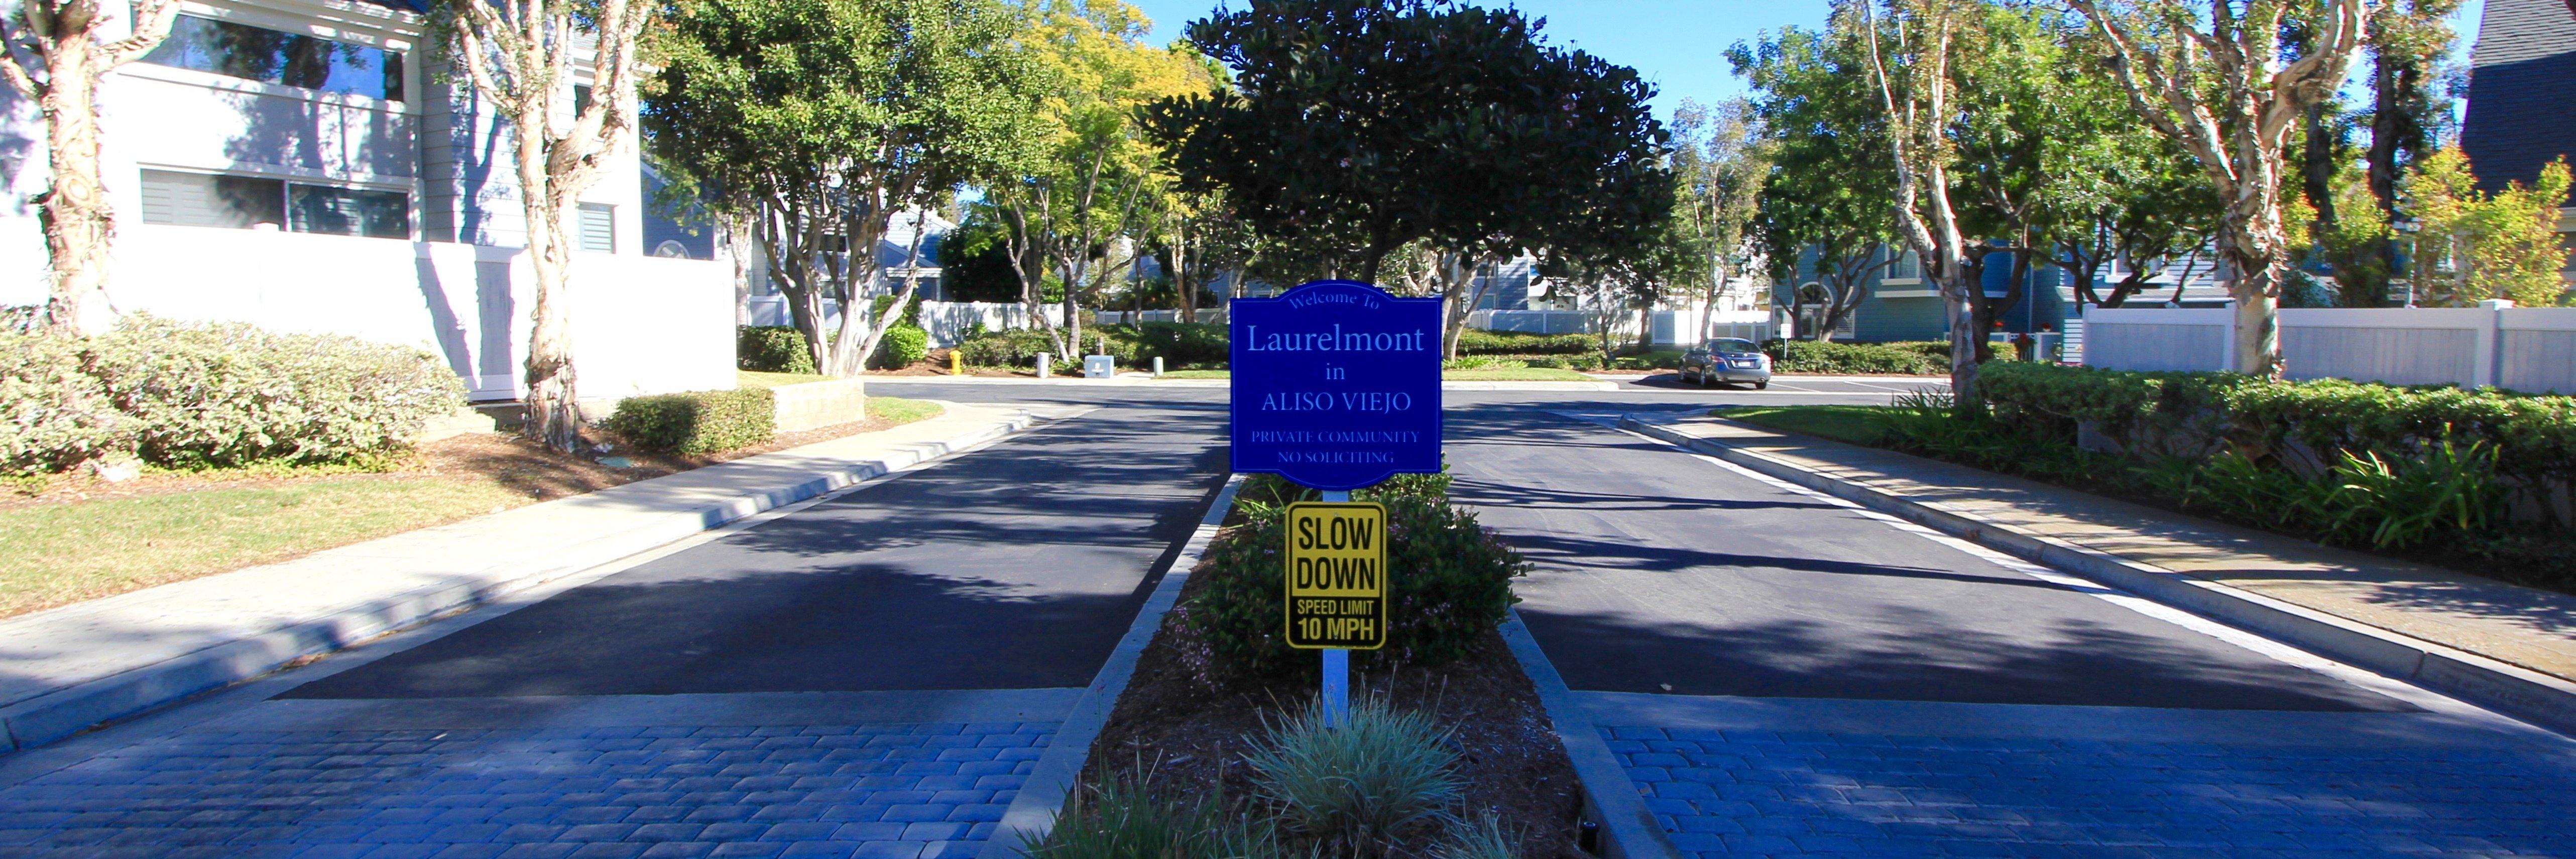 Laurelmont Community Marquee in Aliso Viejo Ca